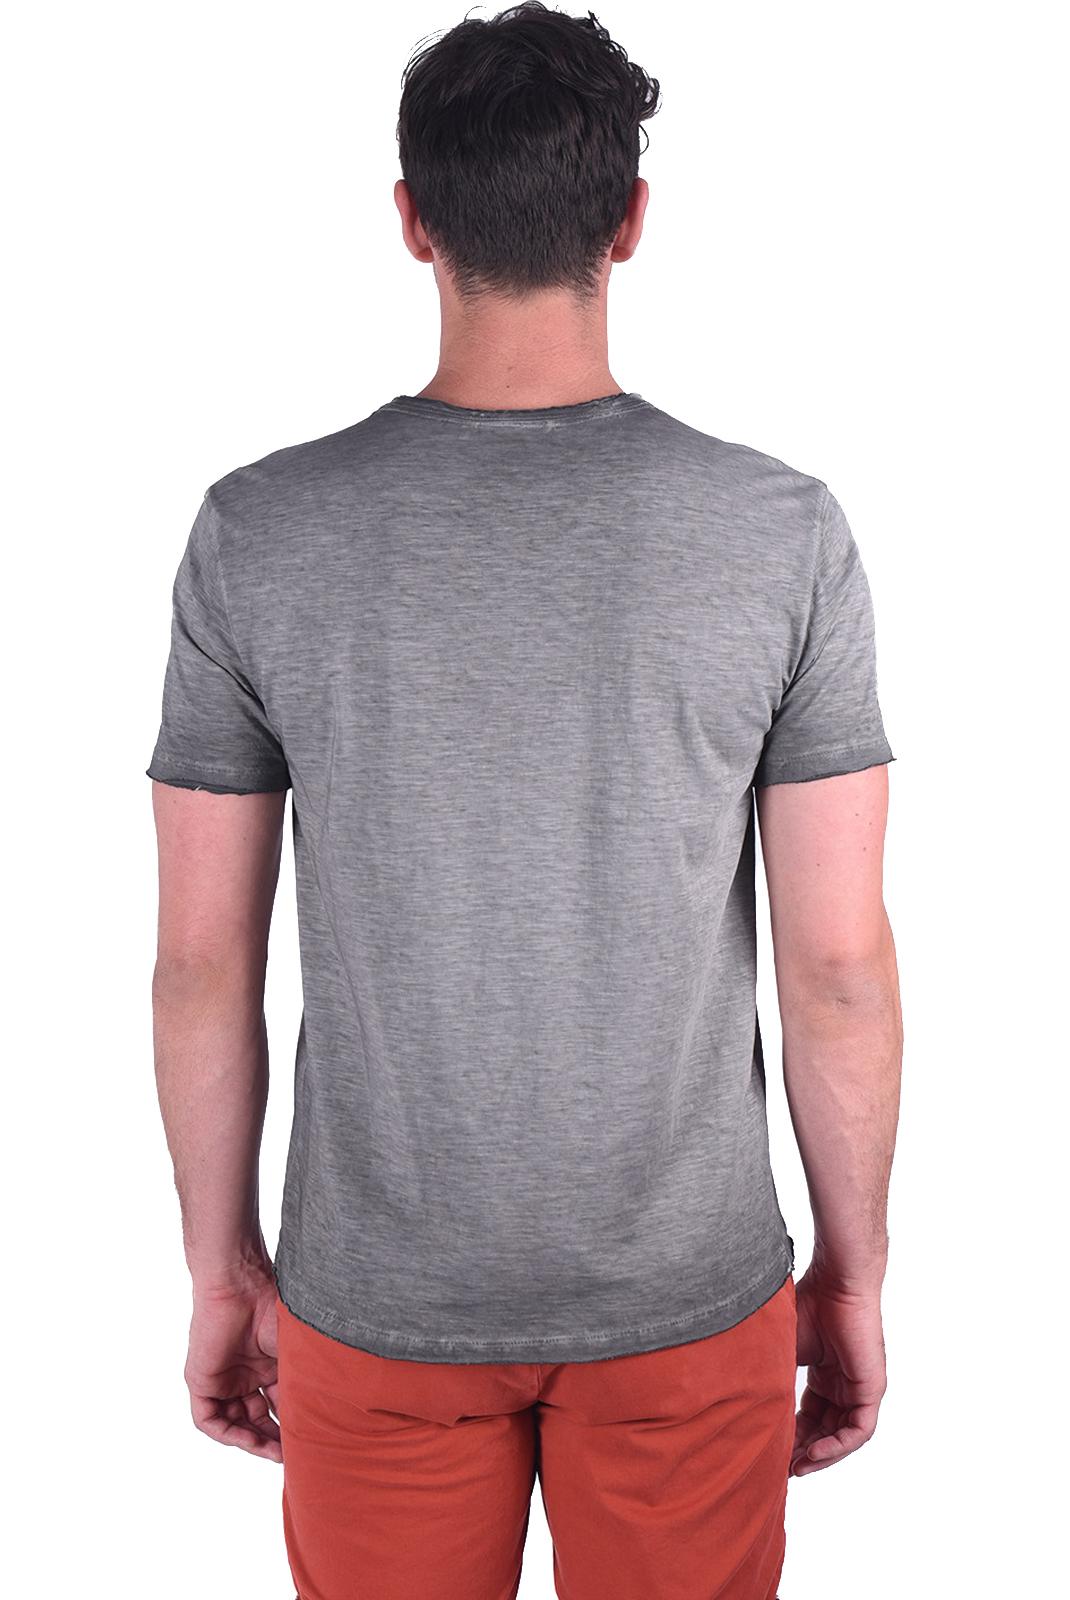 Tee-shirts  Kaporal BRUGE TITANIUM